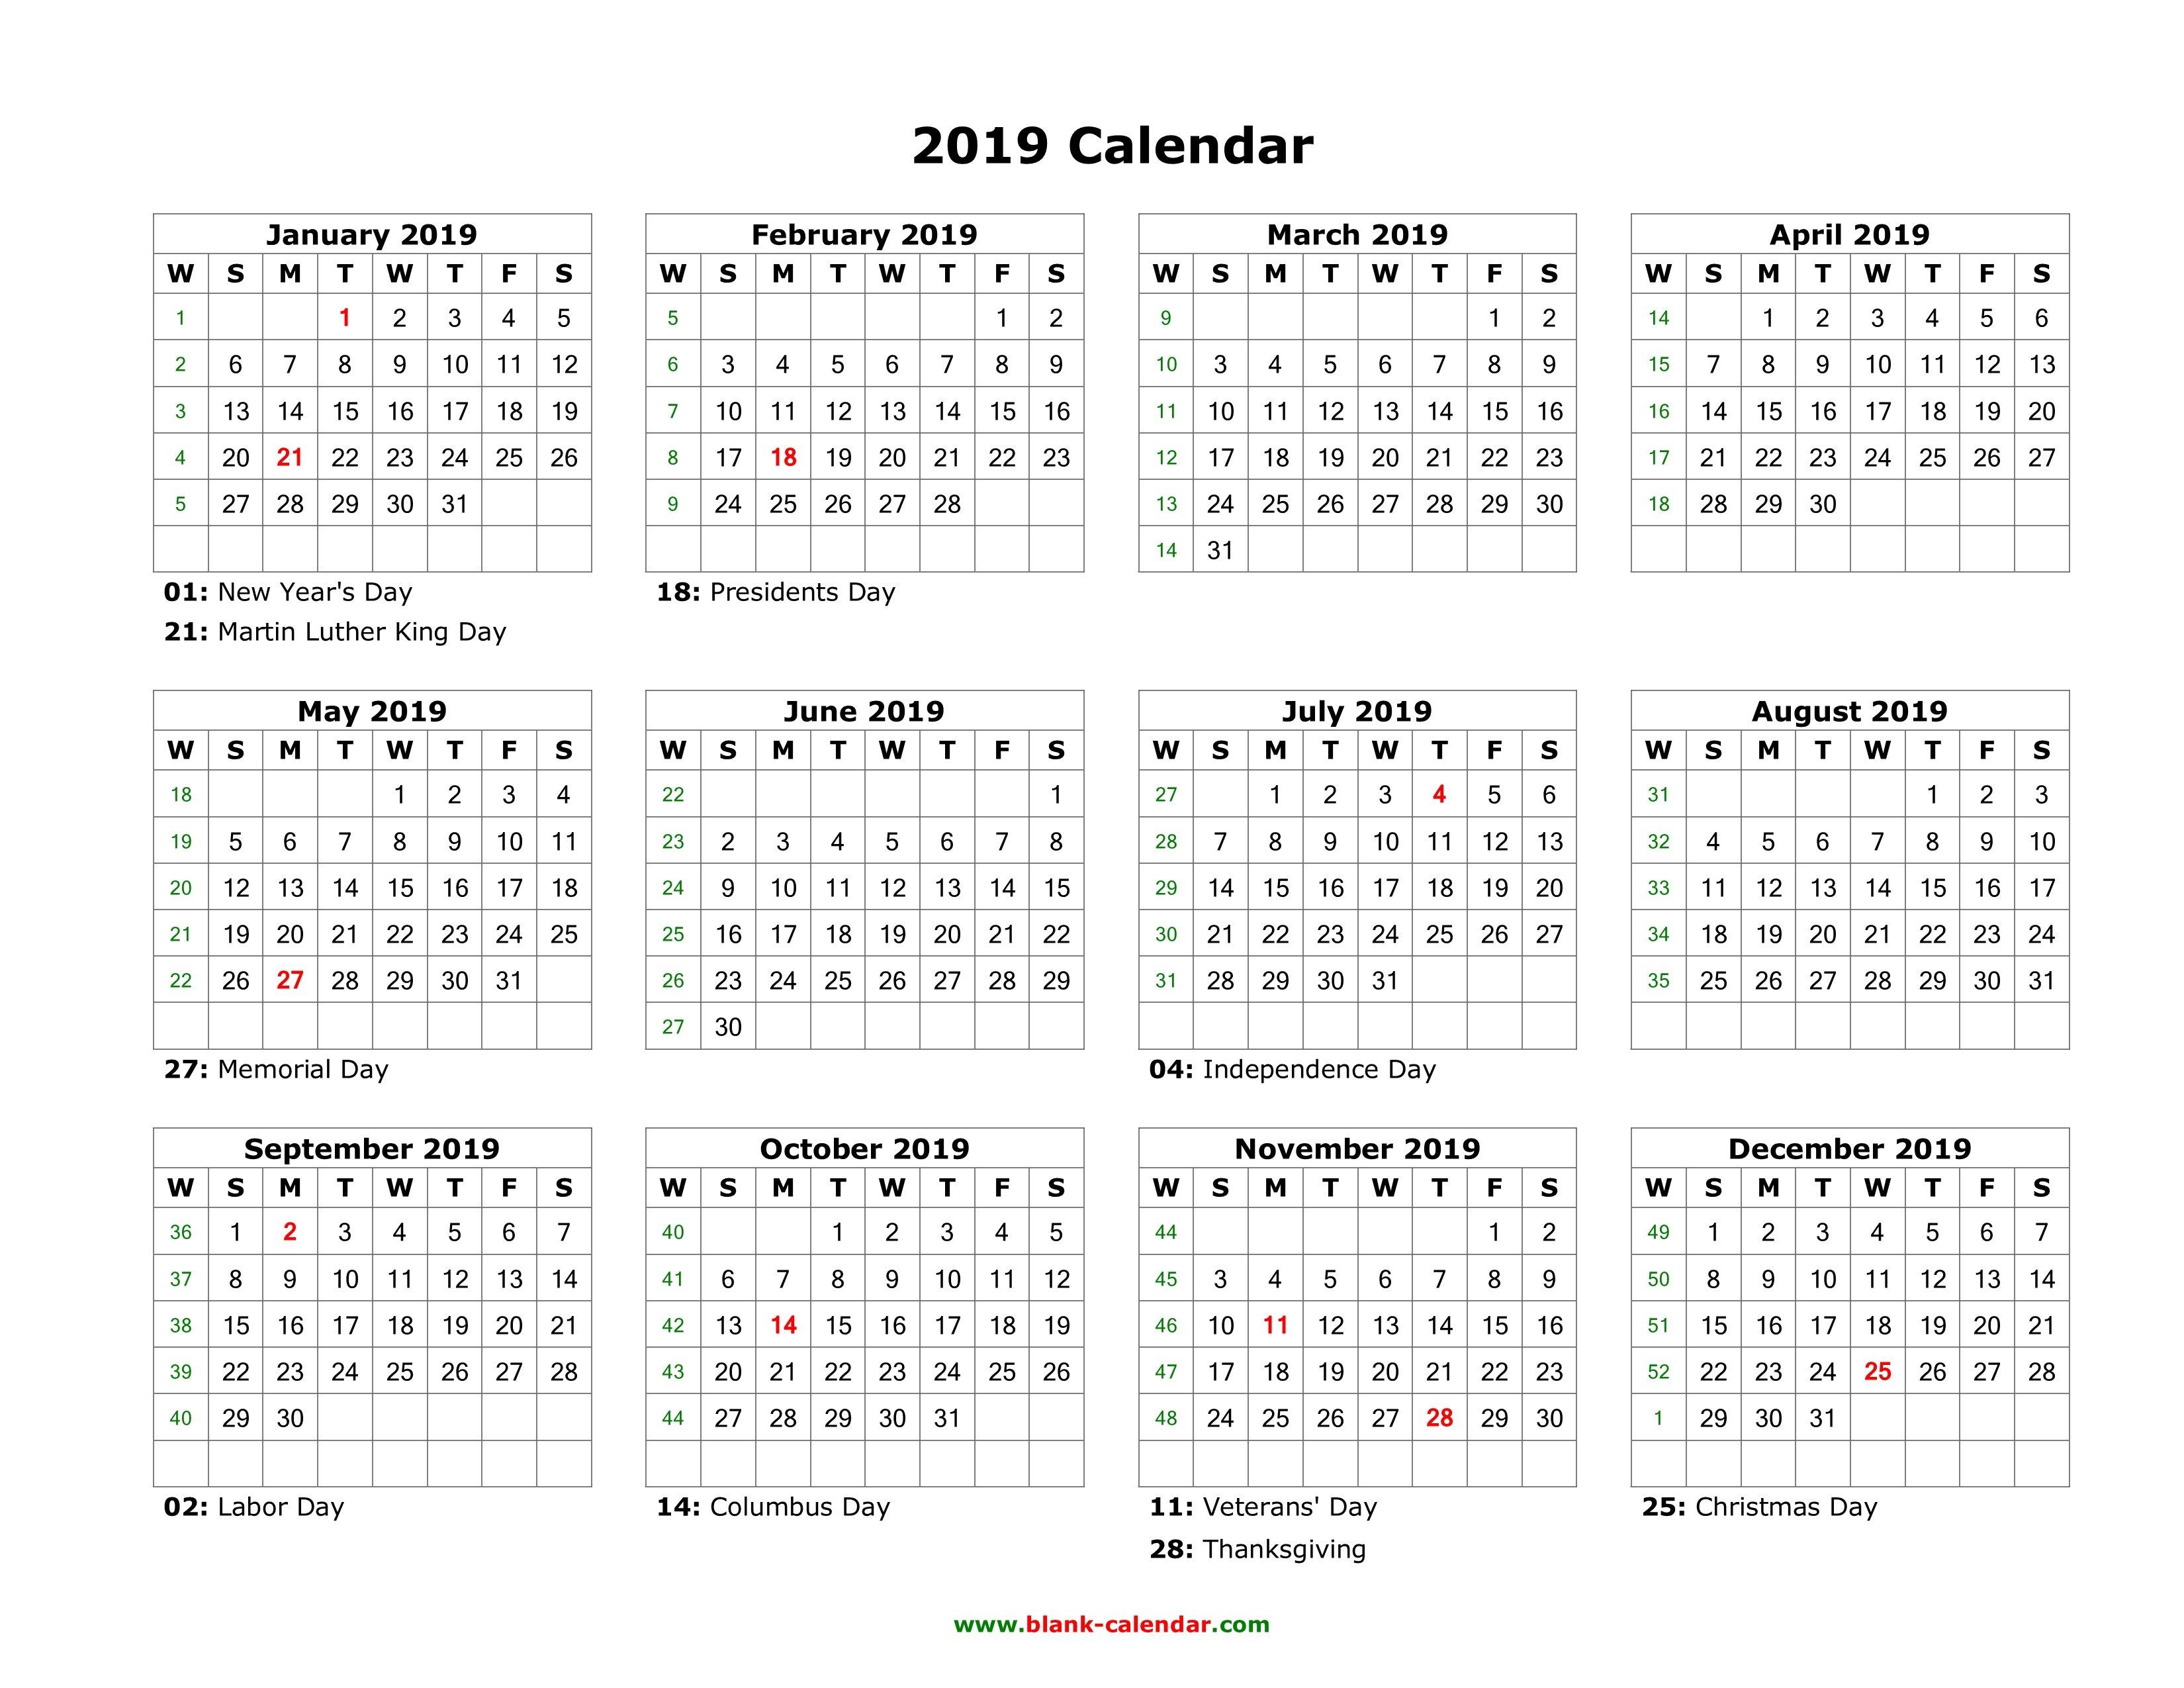 Blank Calendar 2019 | Free Download Calendar Templates Calendar 2019 Indesign